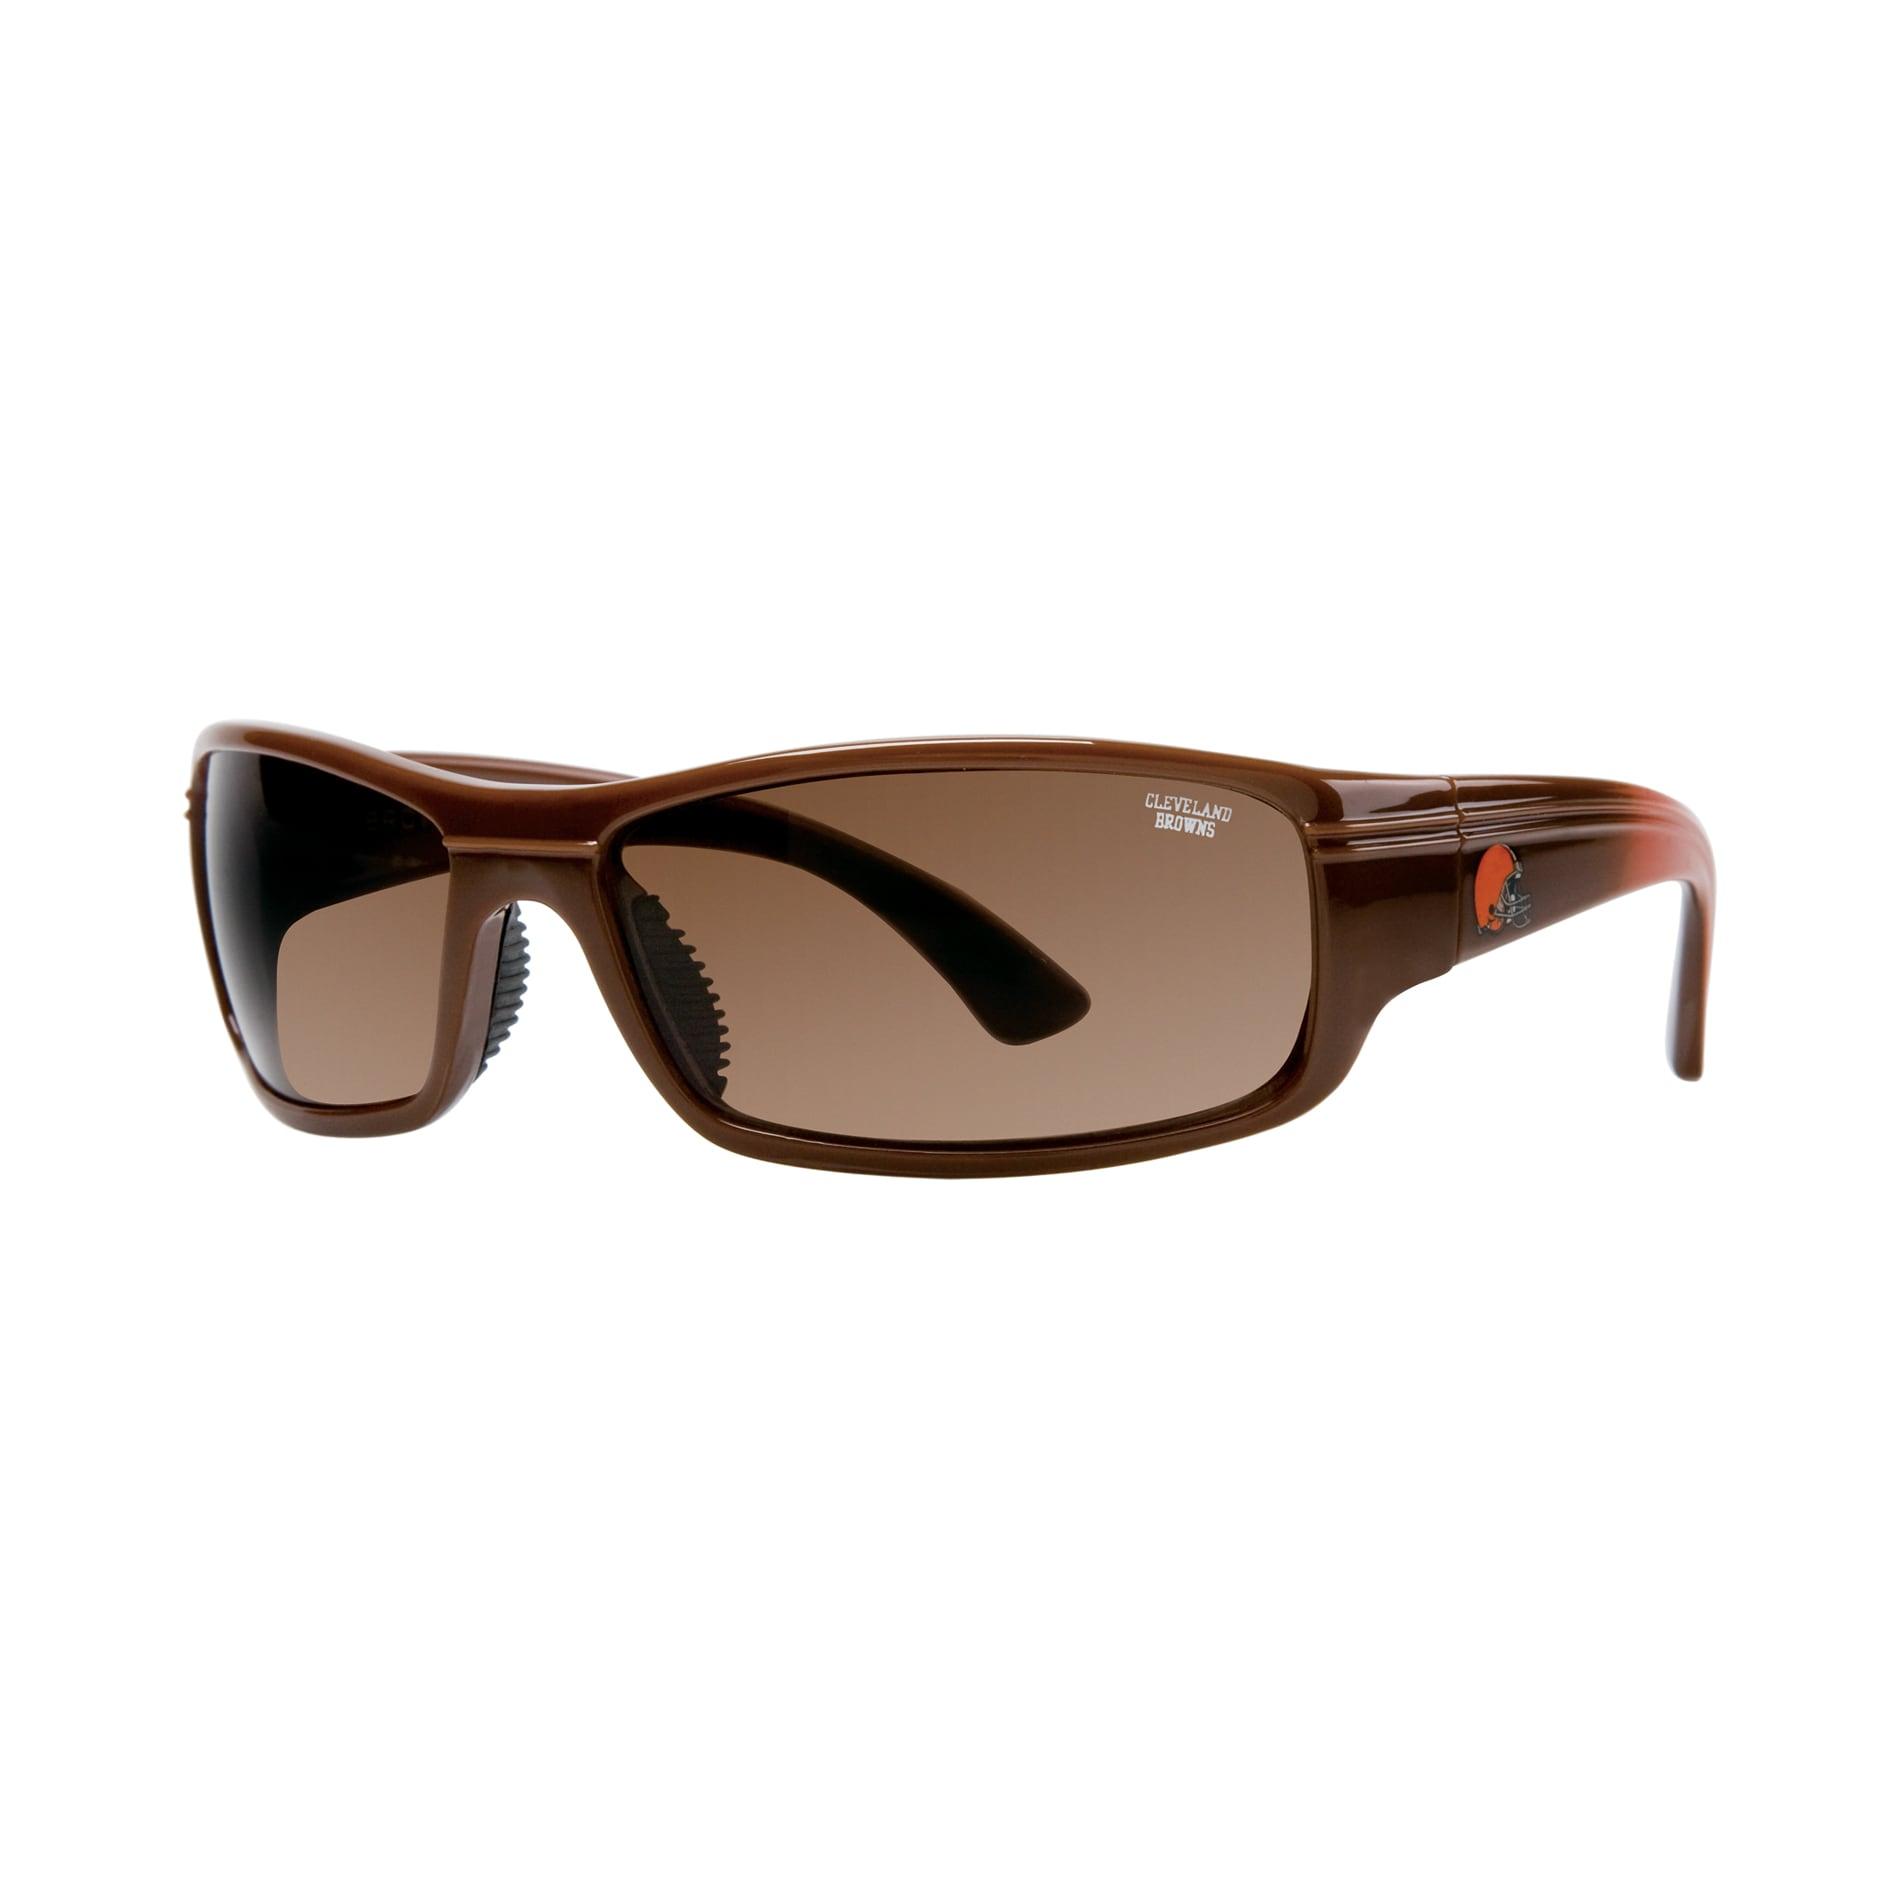 Modo Cleveland Browns Men's 'Block 2' Sunglasses